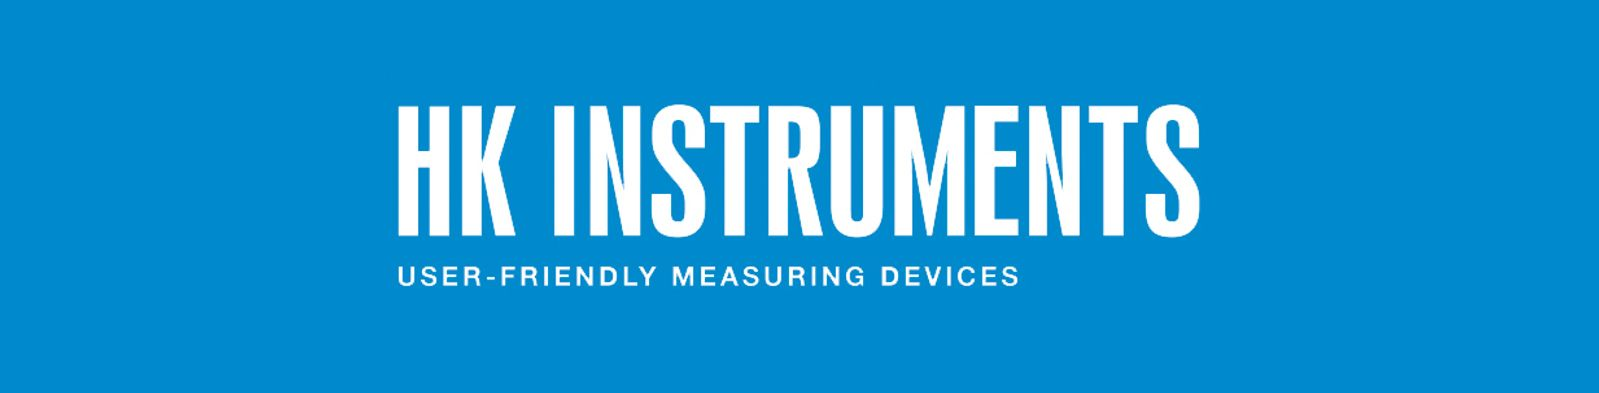 فروش انواع محصولات HK instruments (HK فنلاند)  (اچ کي اينسترومنتس) http://hkinstruments.fi/